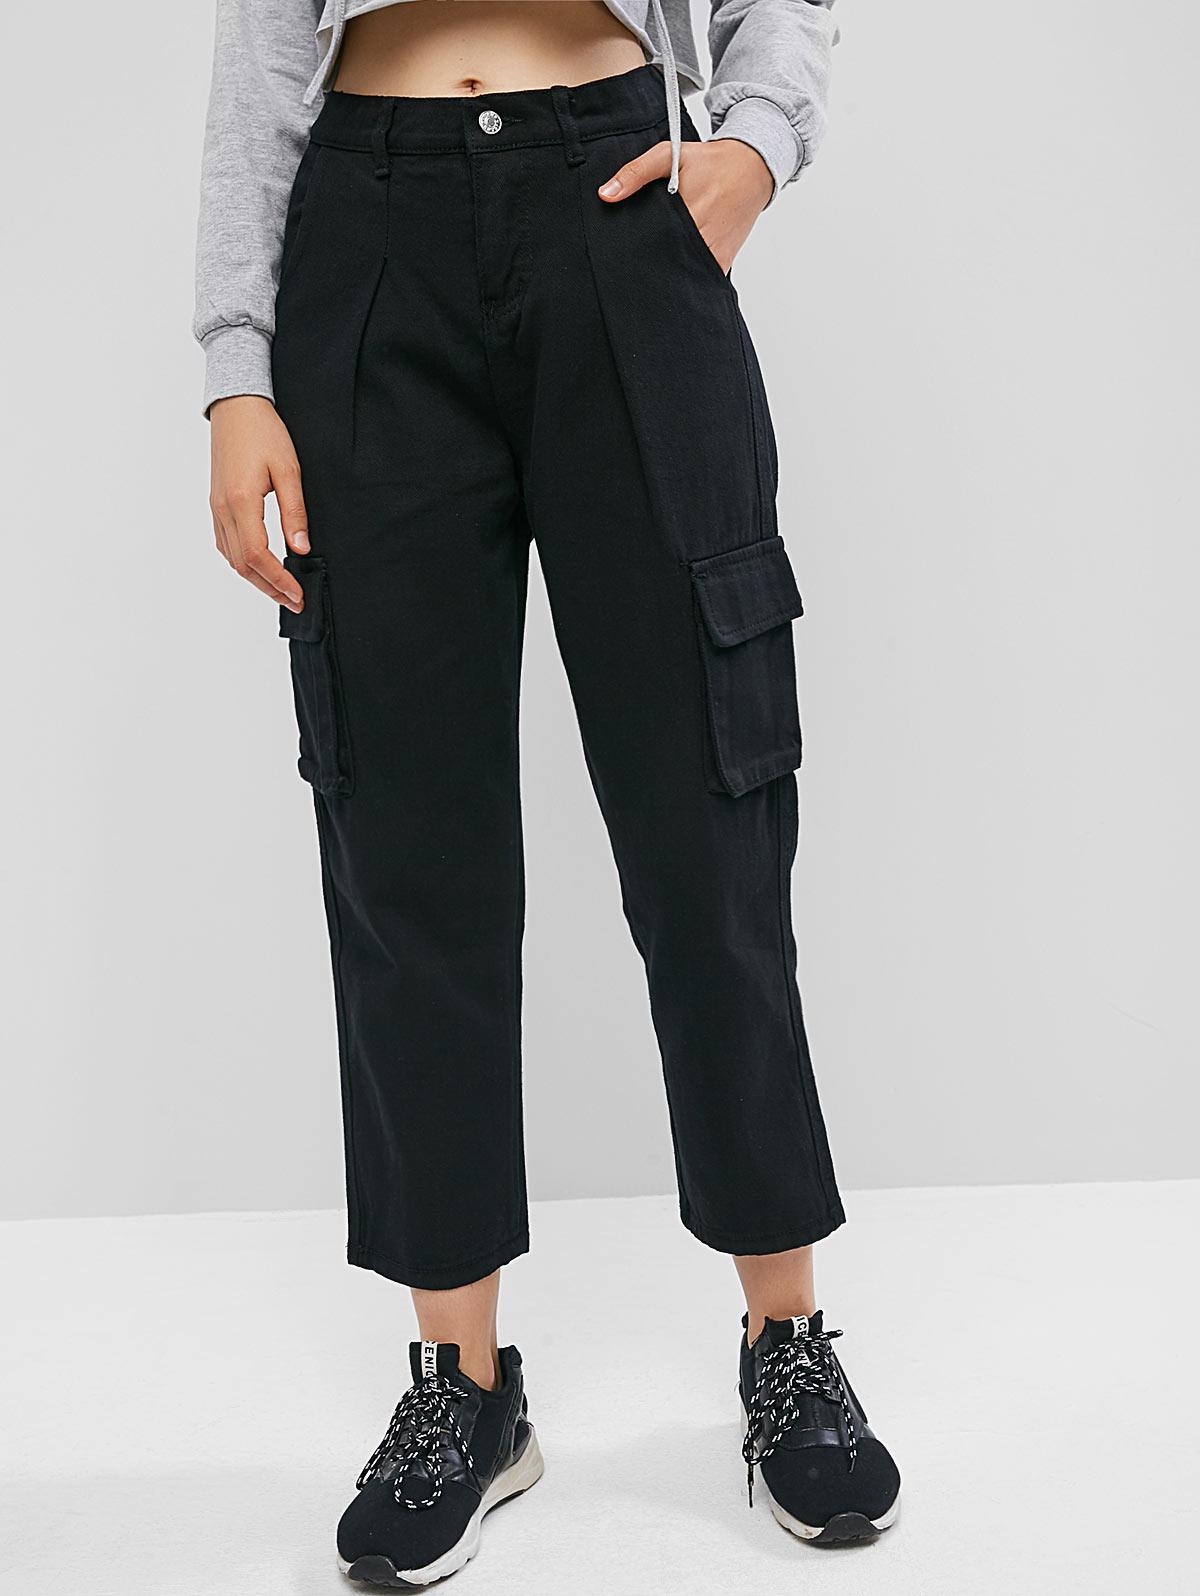 High Waisted Flap Pockets Straight Pants, Black